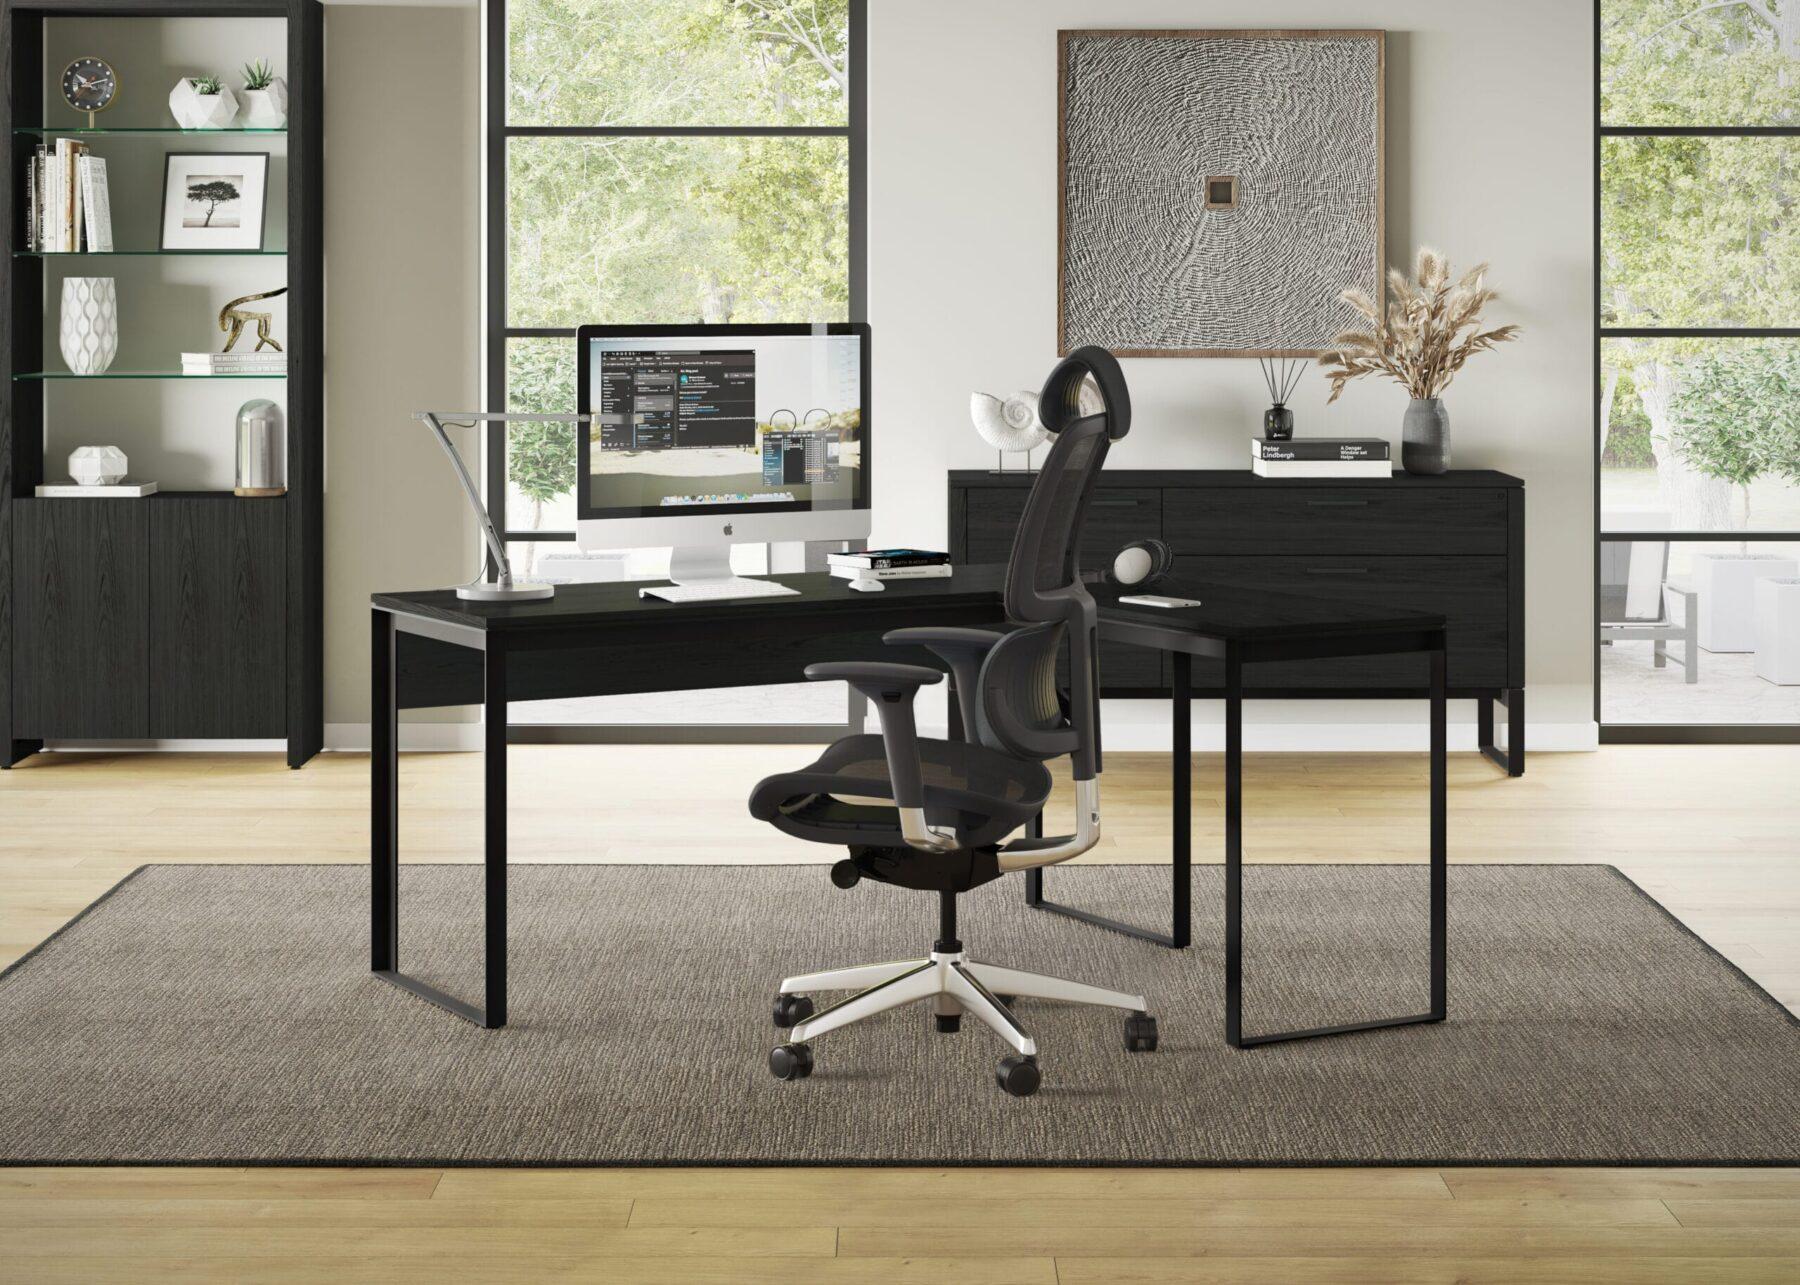 Linea-Work-Desk-6223-and-Return-6224-Corner-Desk-CRL